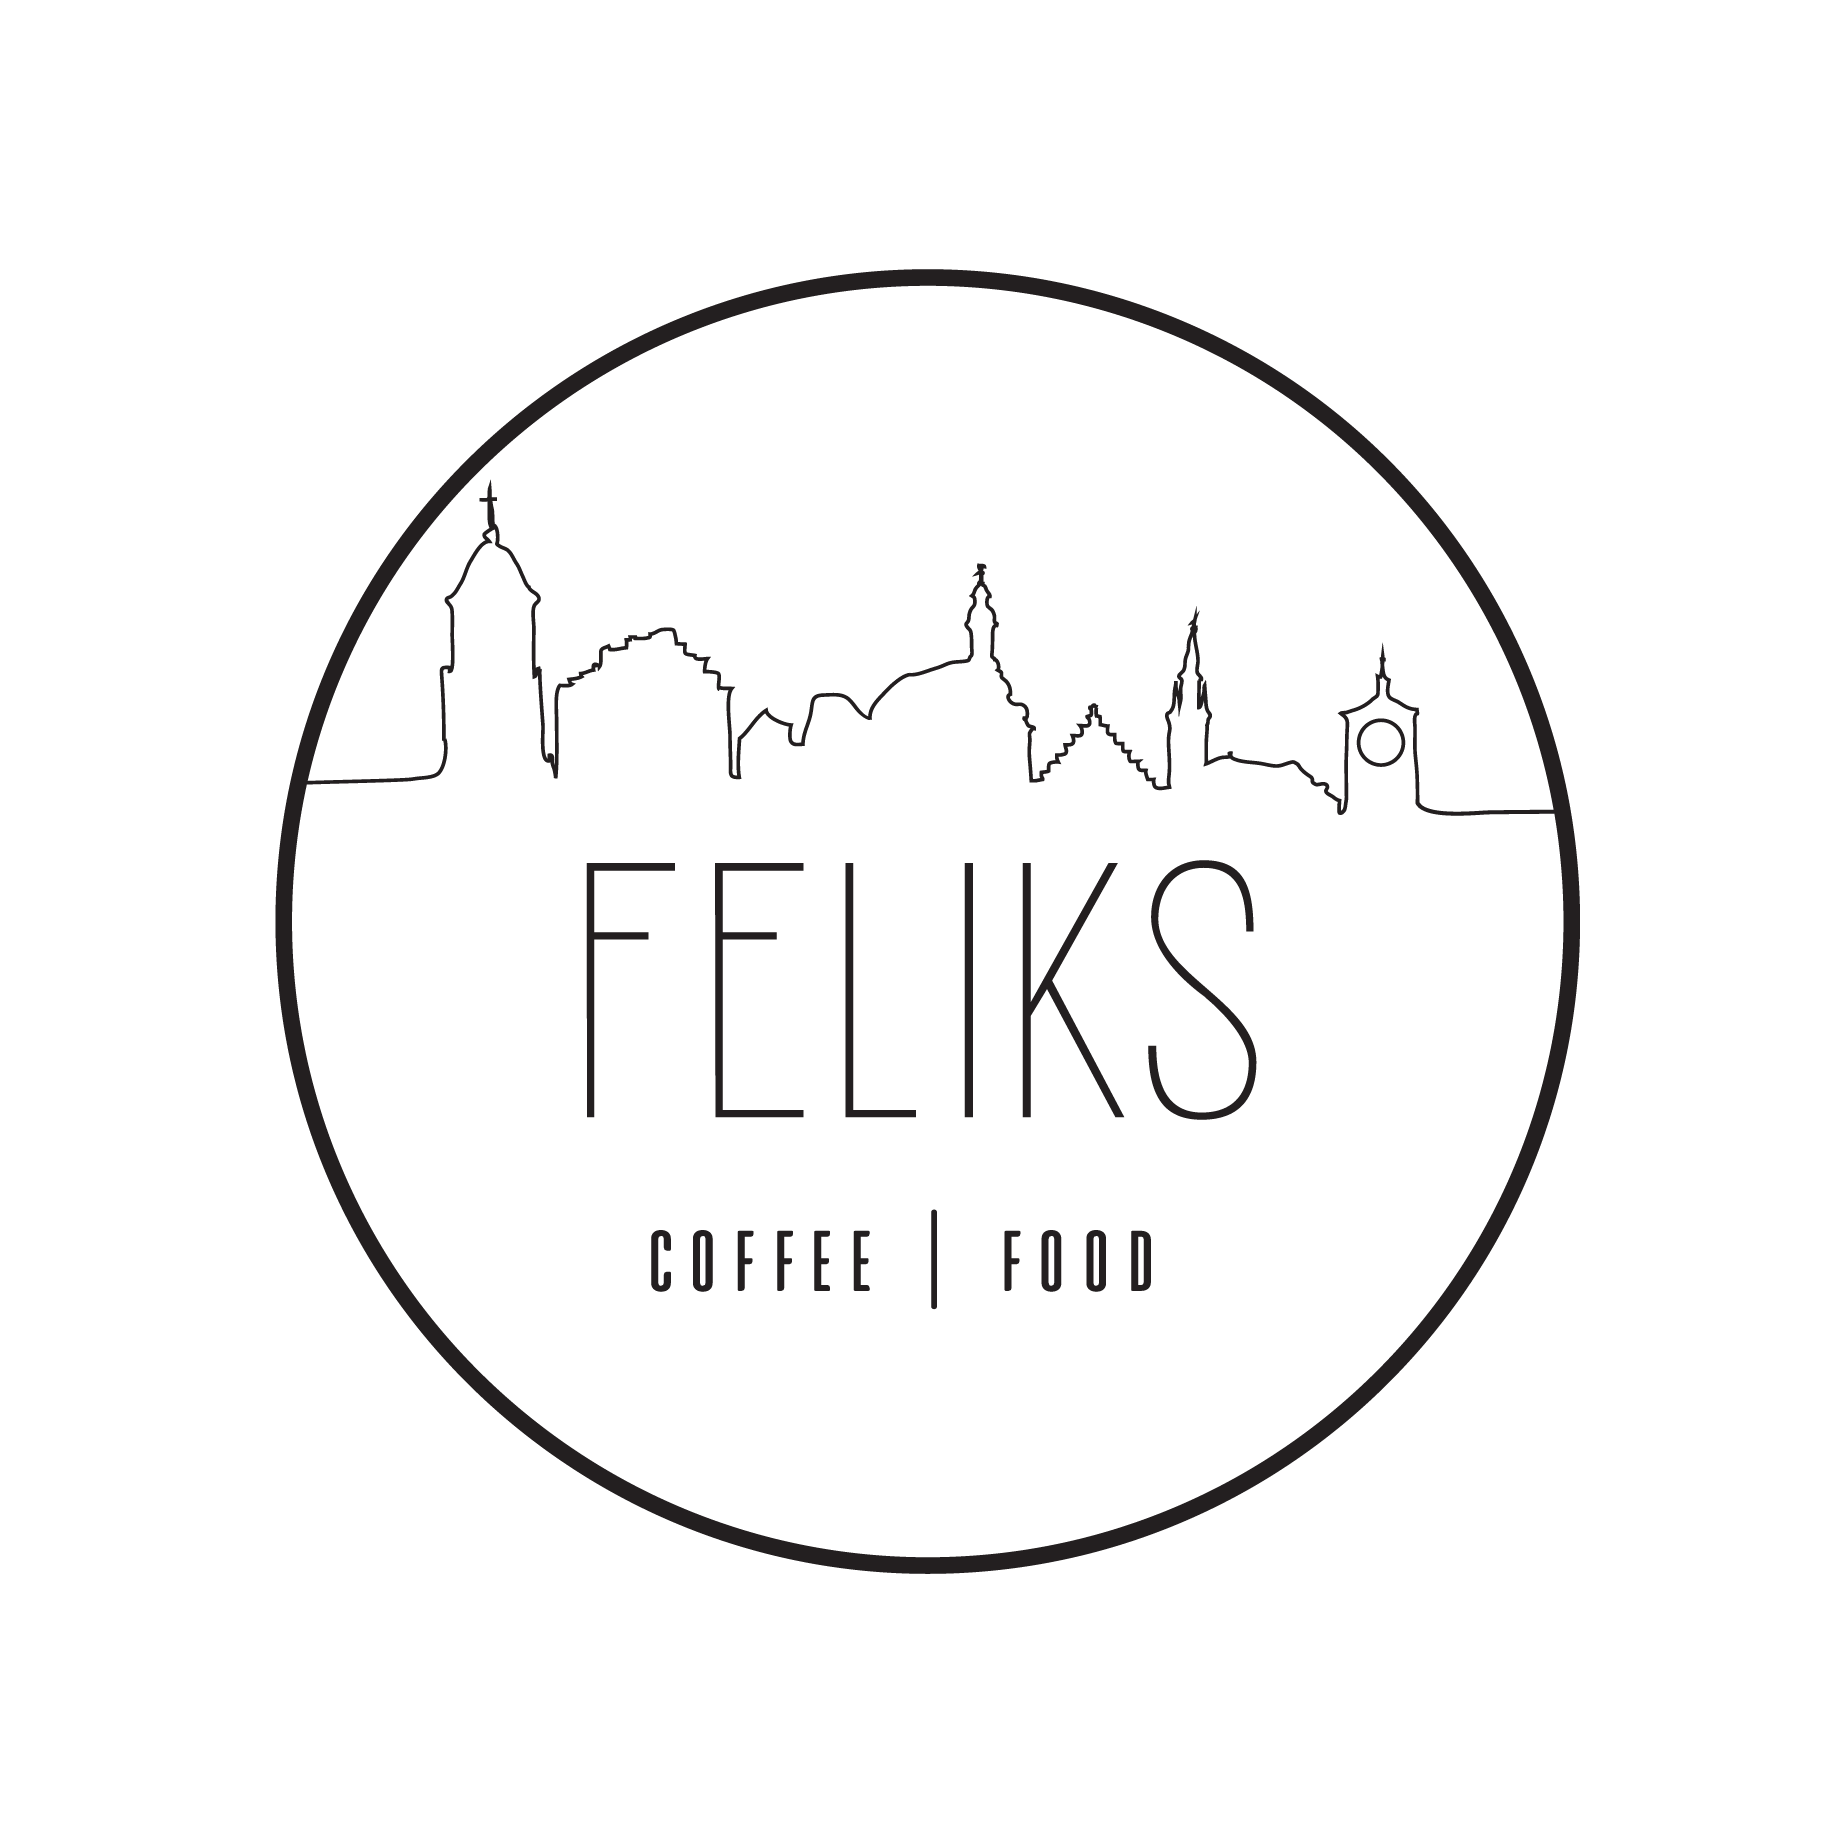 FELIKS